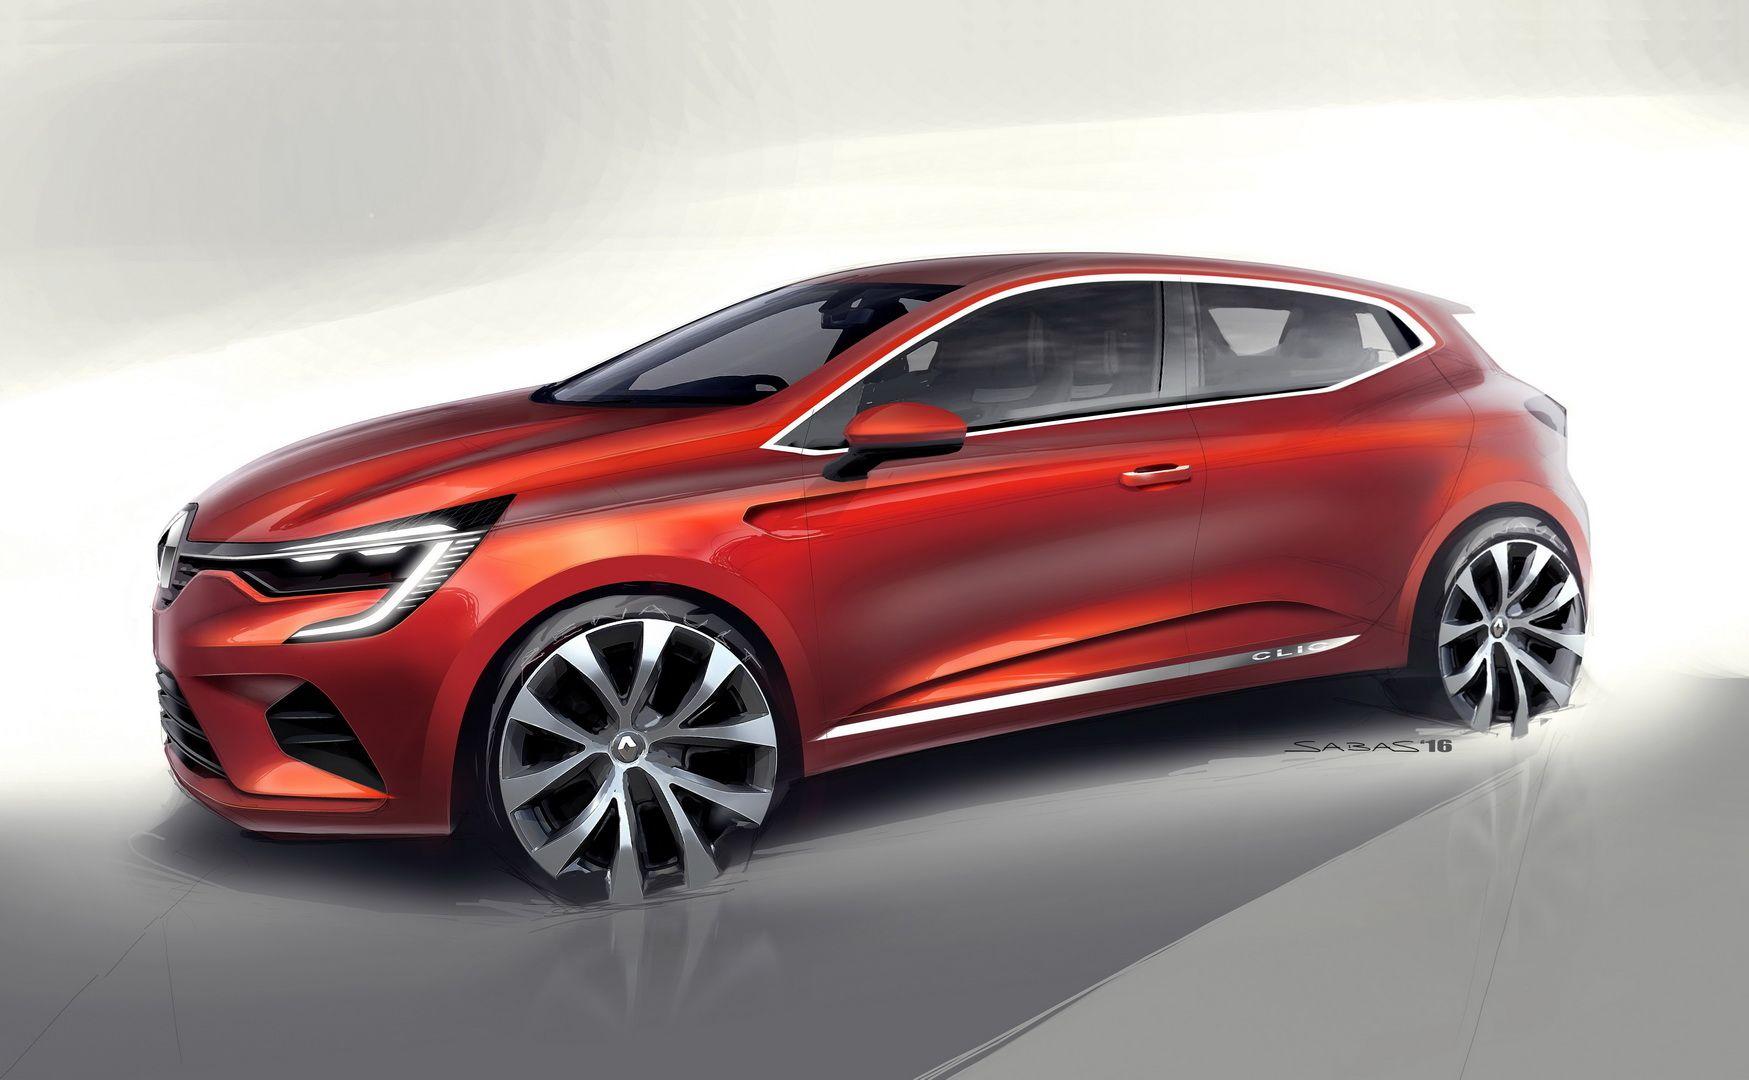 2020 Renault Clio Is Ready To Conquer The Supermini Segment Carscoops Renault Clio Car Design Car